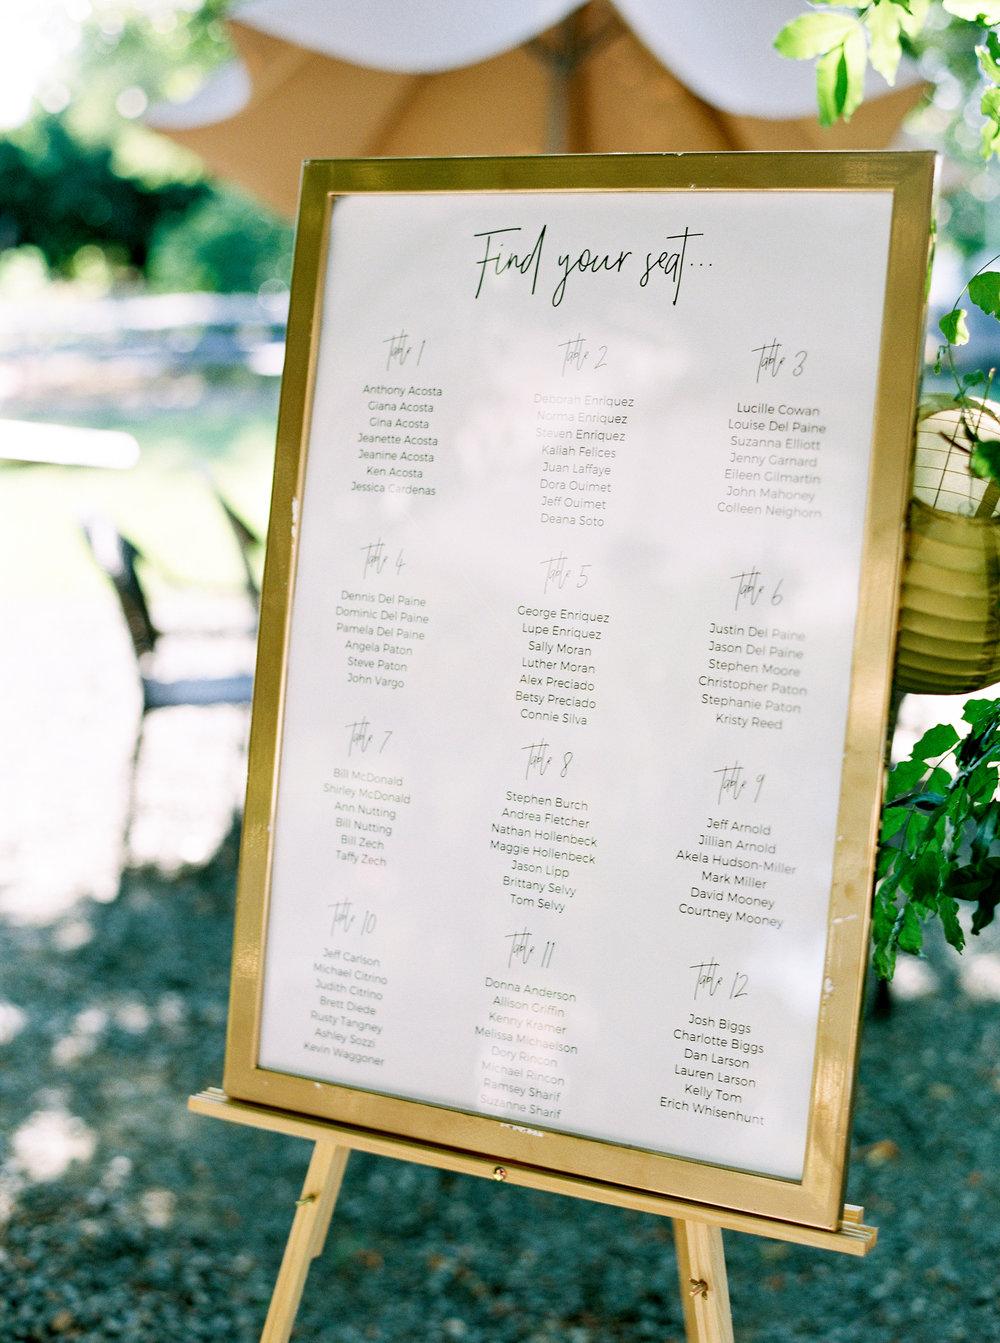 Durst-winery-wedding-in-lodi-calfornia-155.jpg